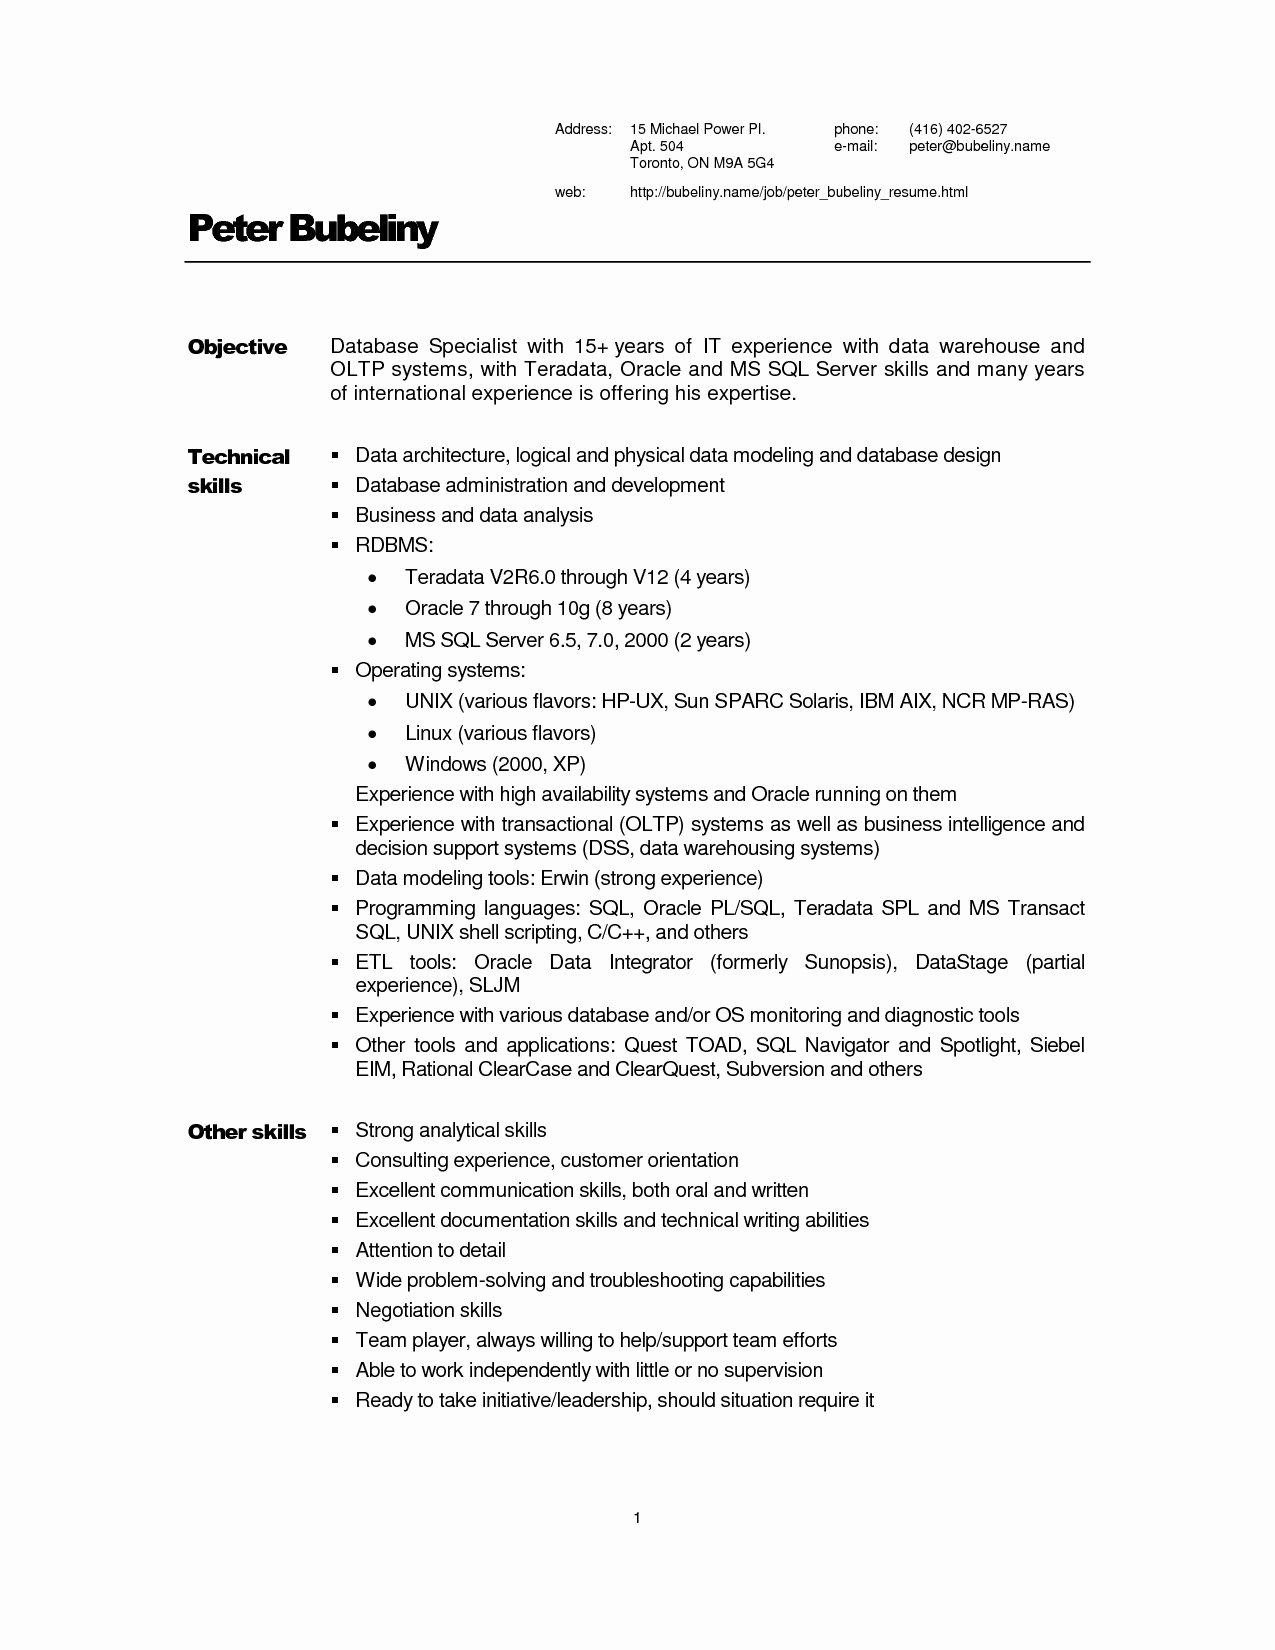 Warehouse associate Job Description for Resume Resume Ideas